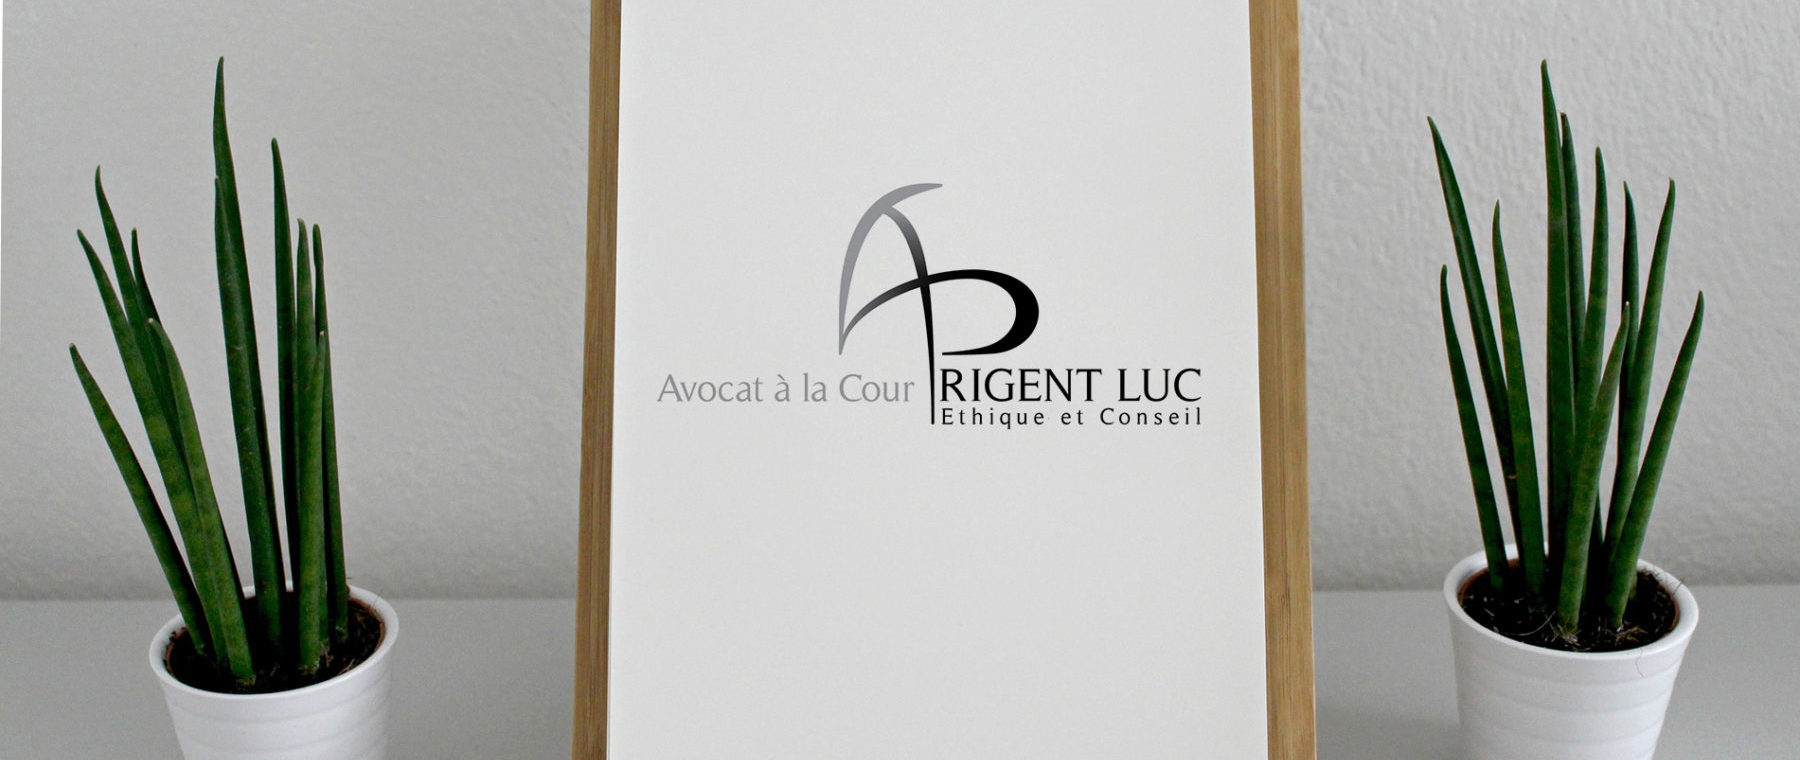 Prigent-Luc-avocat-logo